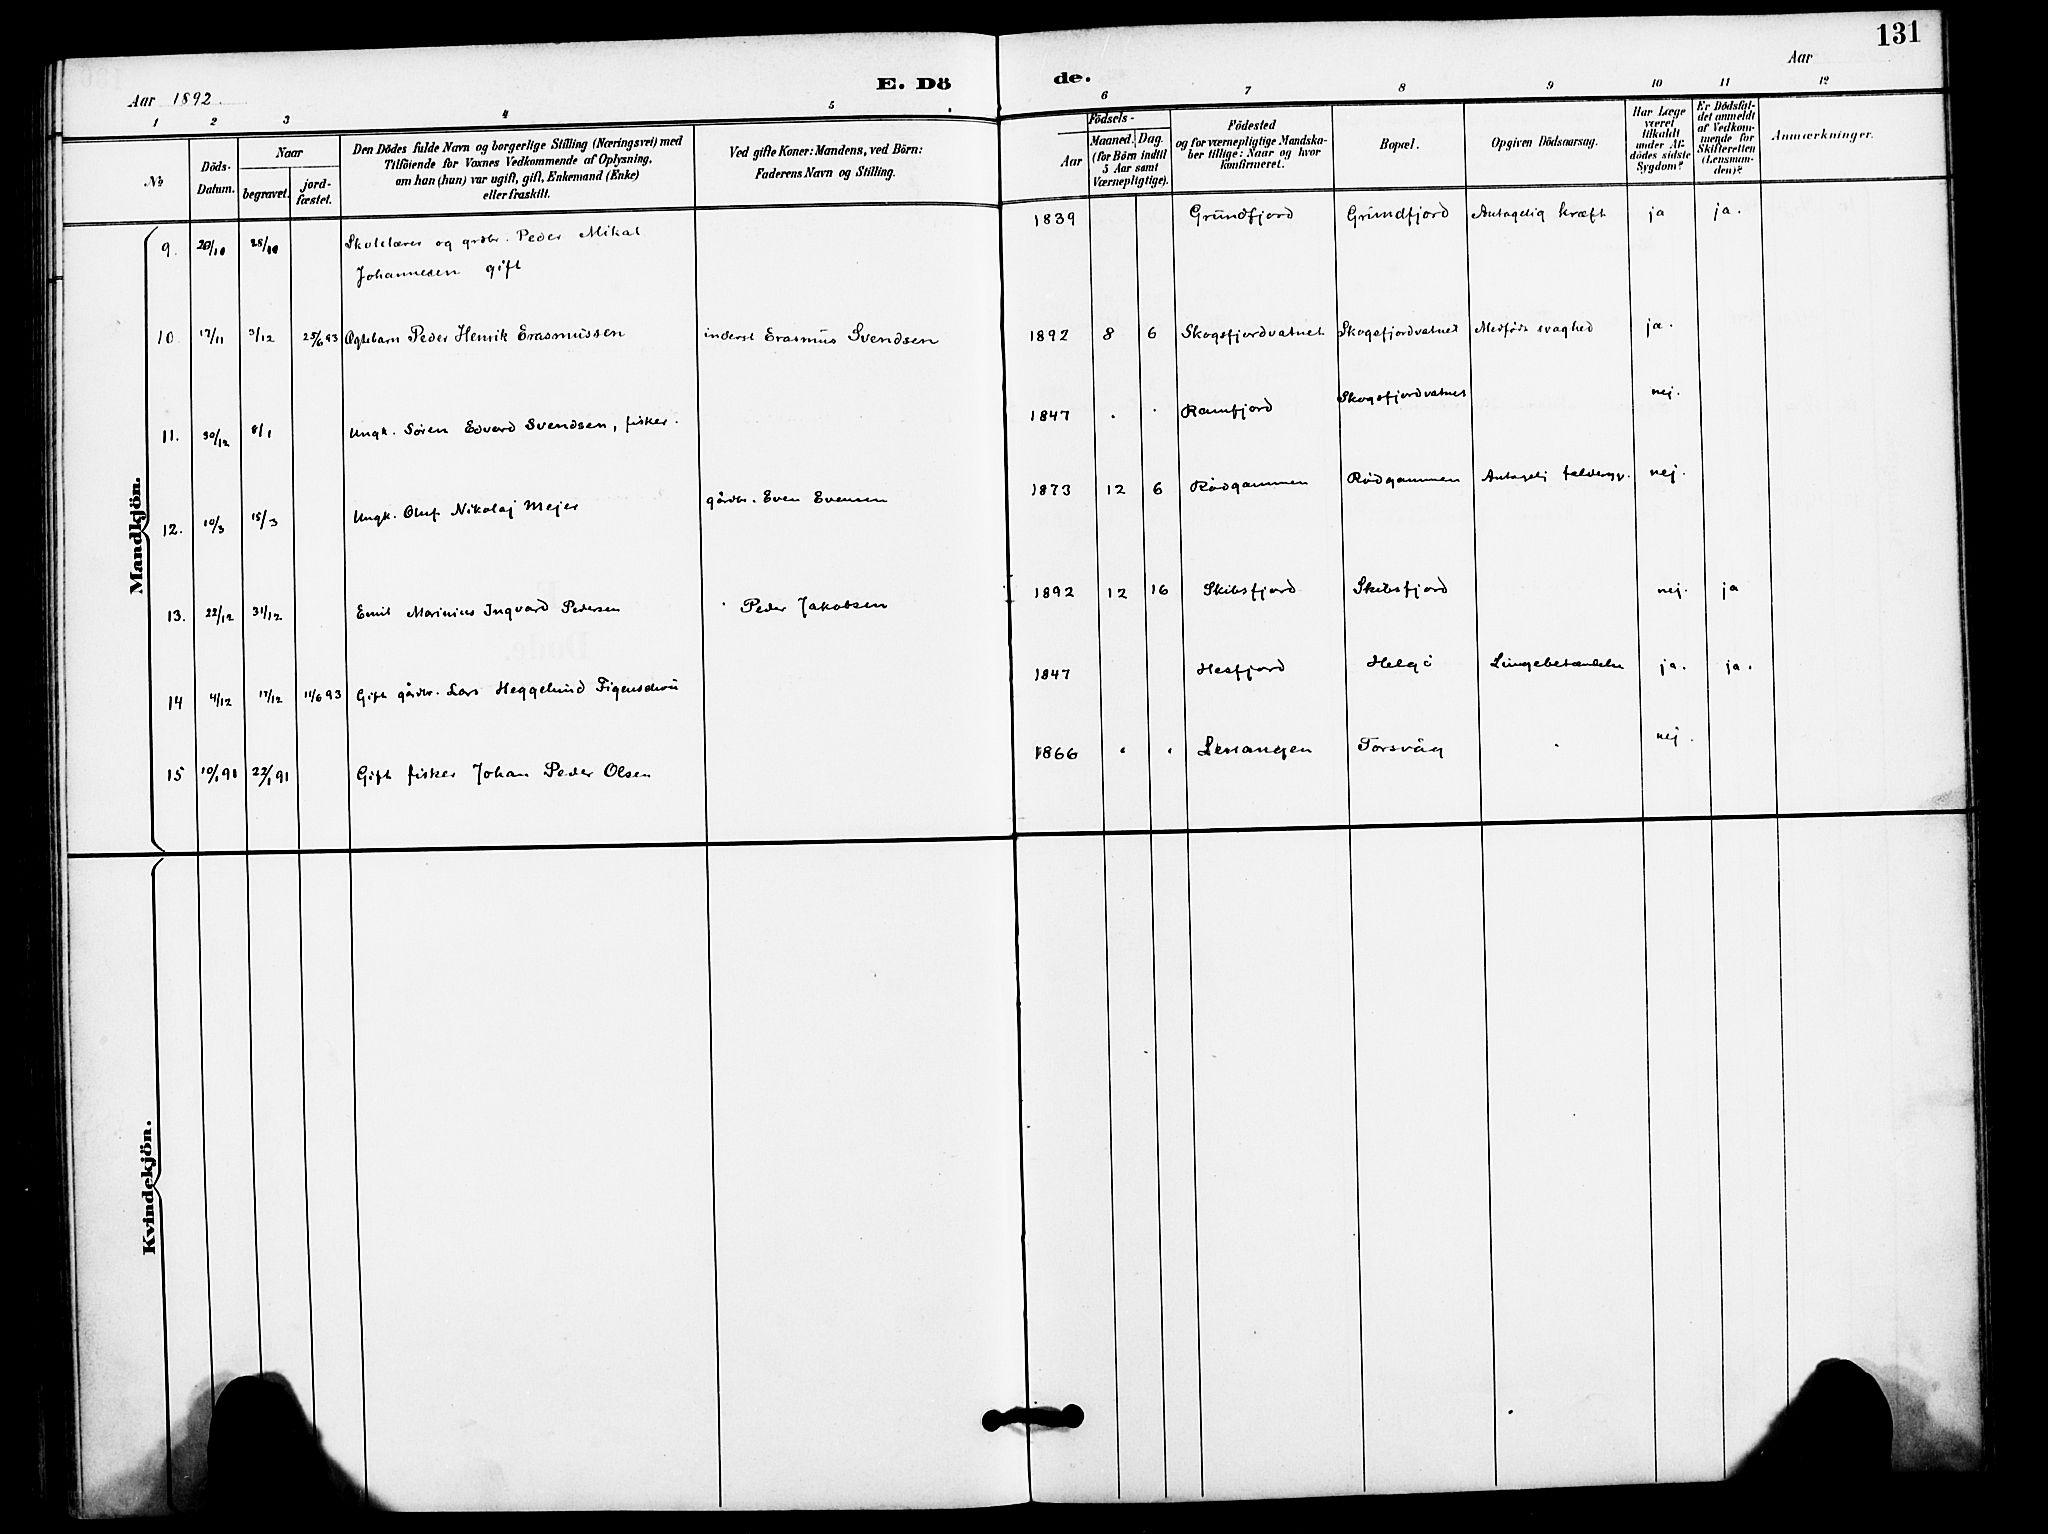 SATØ, Karlsøy sokneprestembete, H/Ha/Haa/L0012kirke: Ministerialbok nr. 12, 1892-1902, s. 131